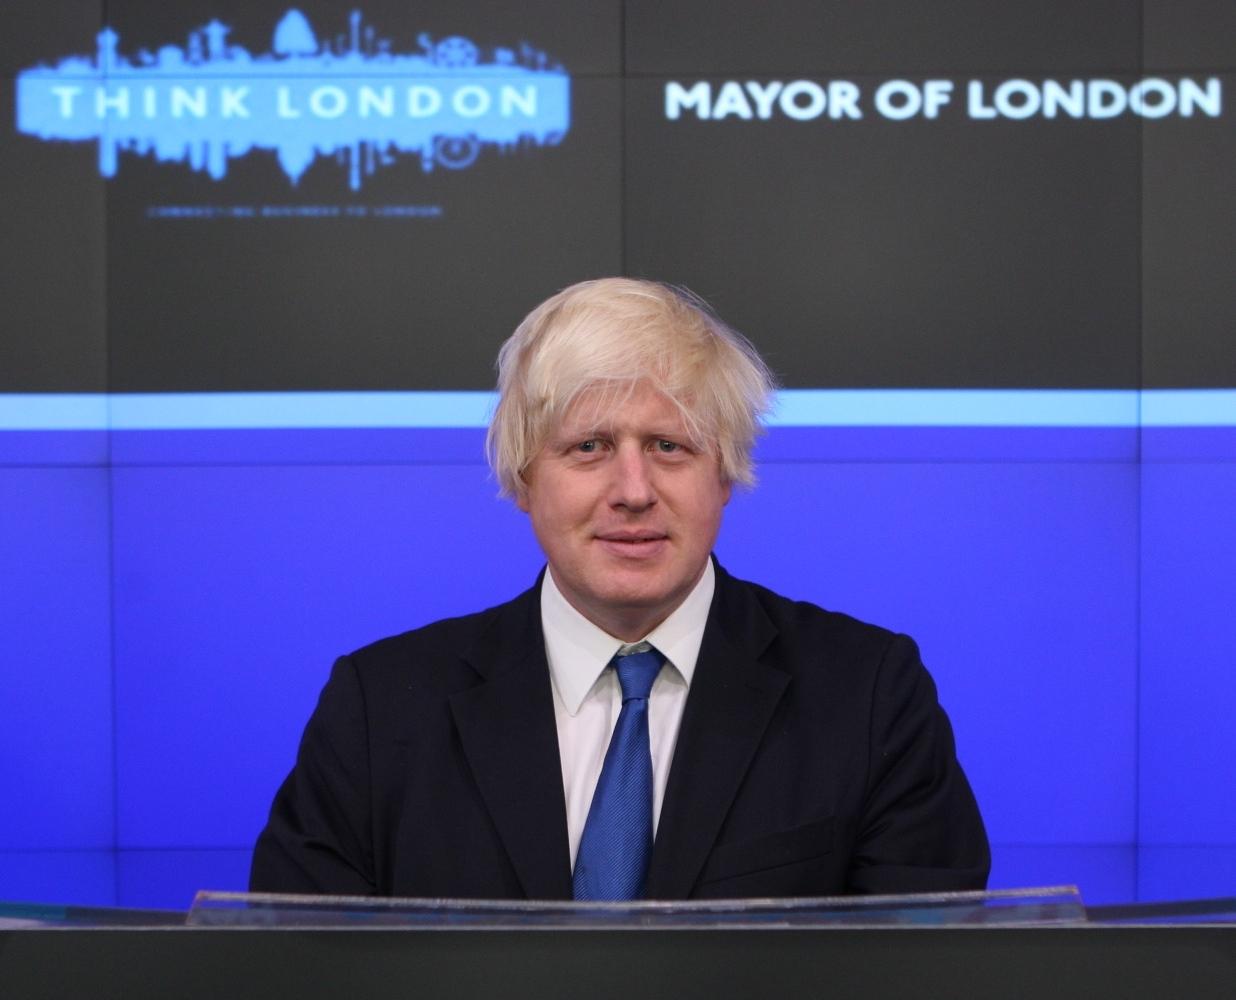 The UK Supreme Court had ruled Boris Johnson's suspension of Parliament unlawful. Photo courtesy: UK government